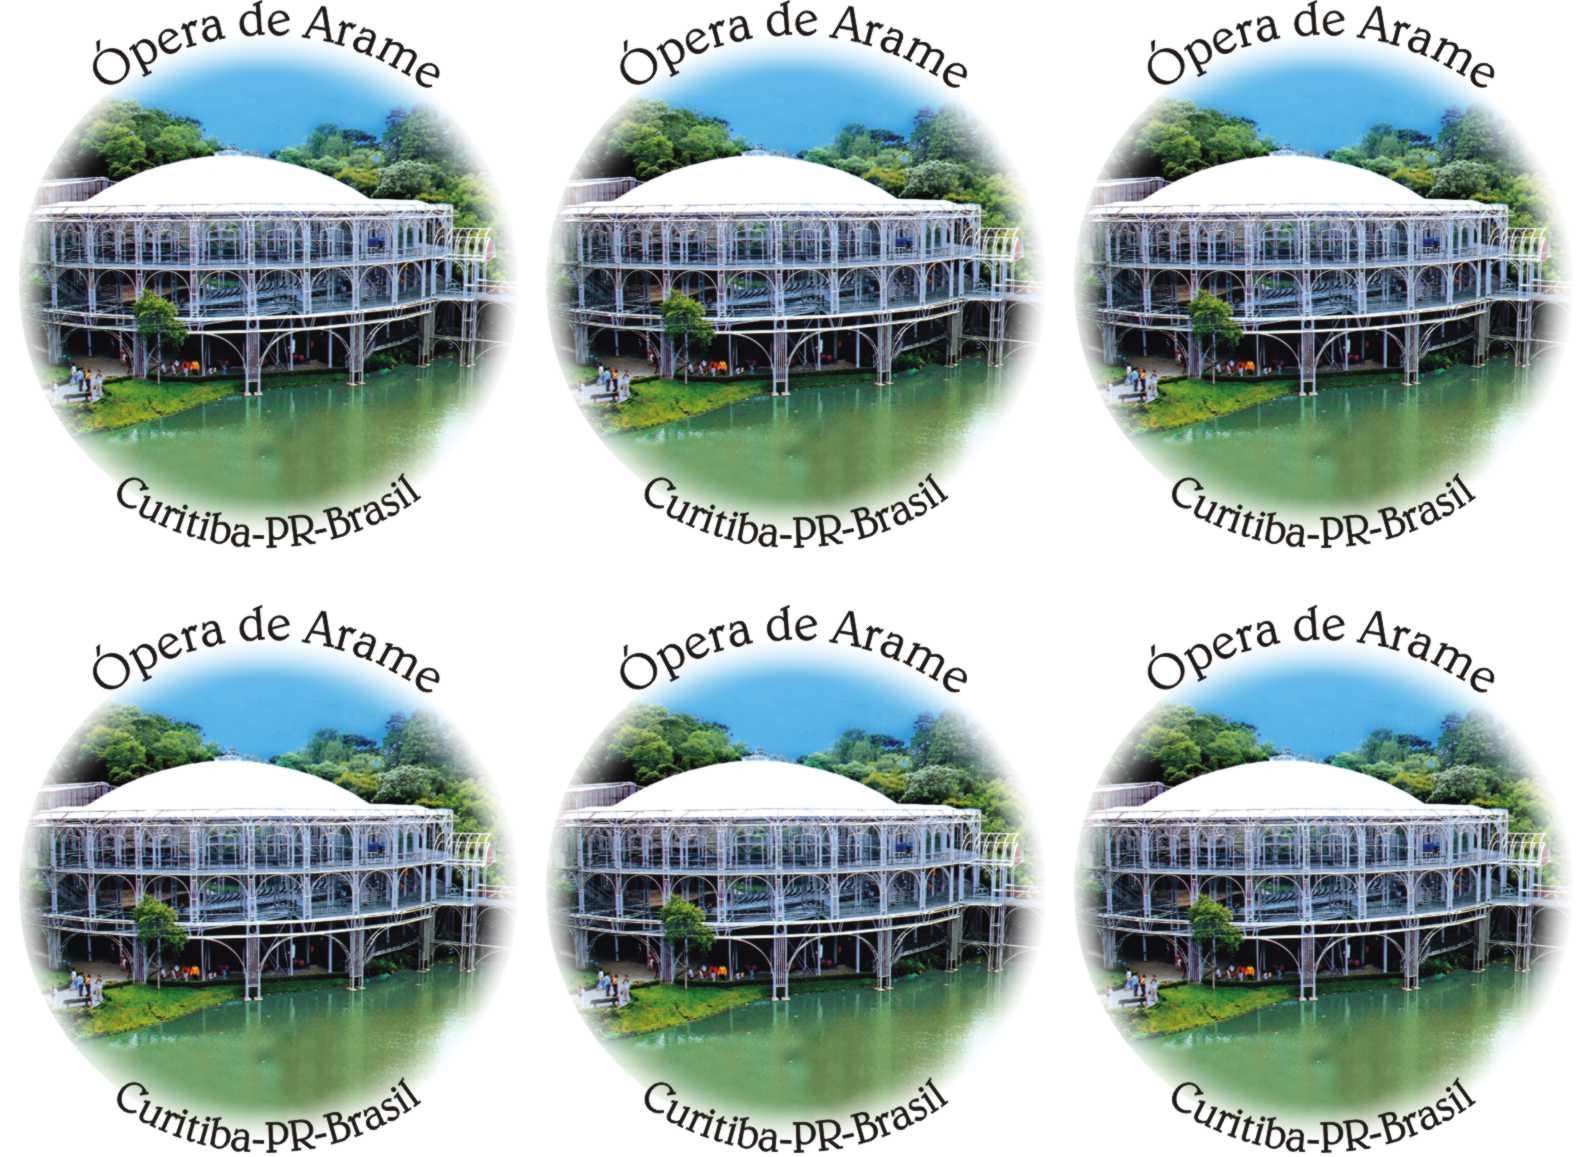 Curitiba -Ópera de Arame 7cm